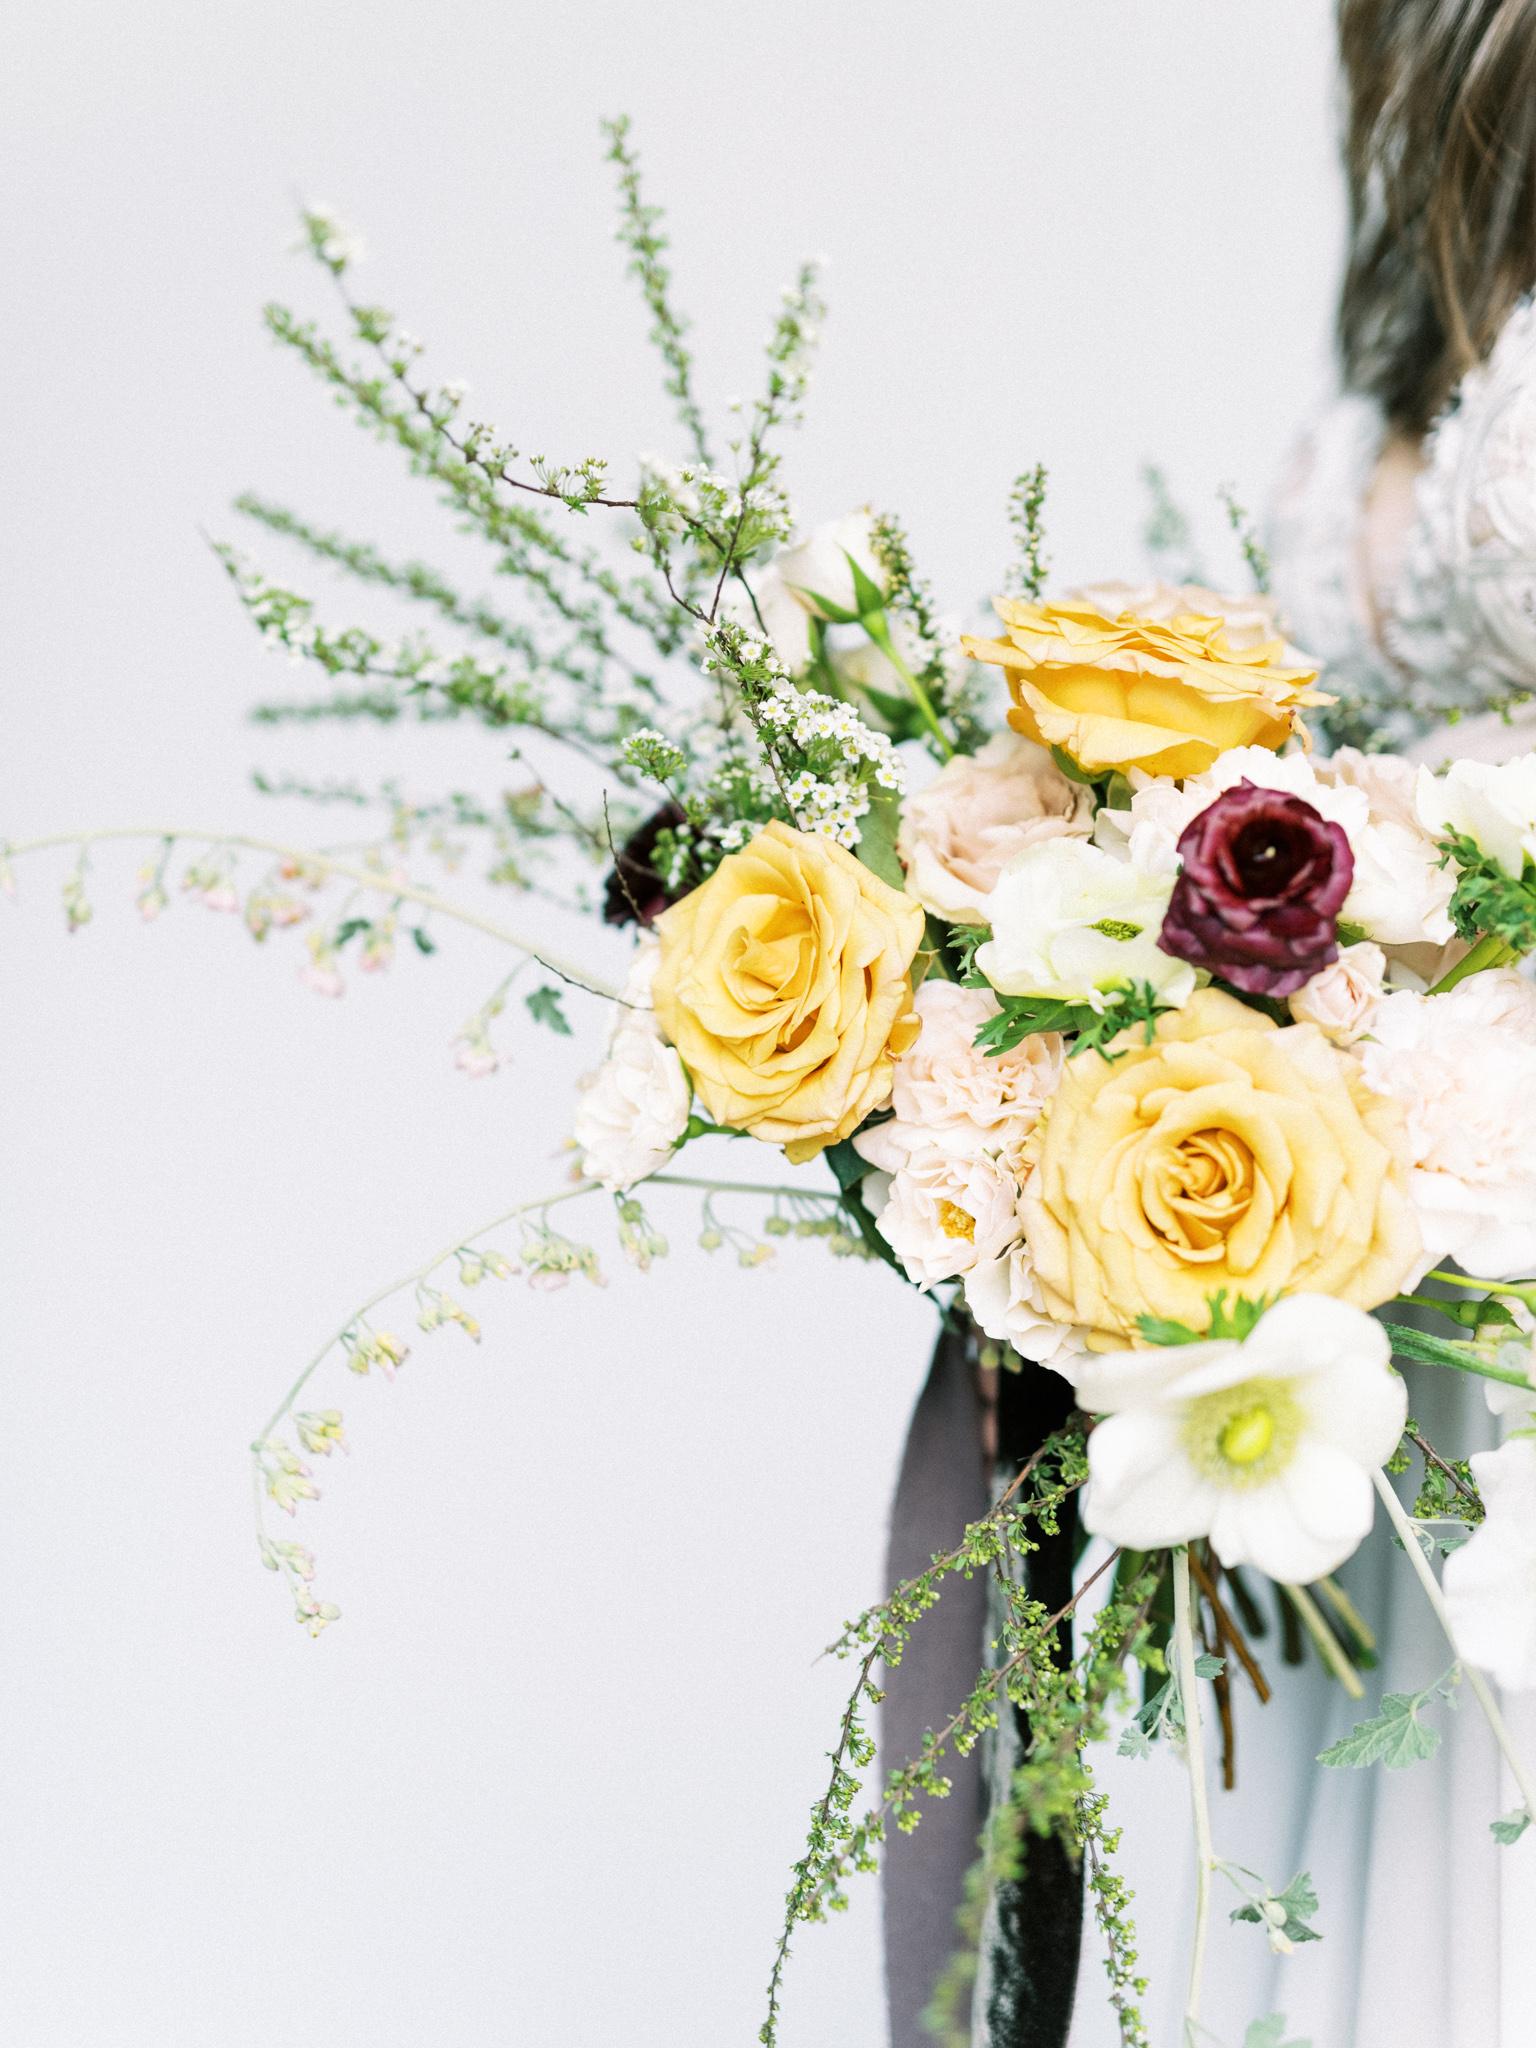 Cultivate Goods Floral Workshop - The Doyle - Kristen Krehbiel - Kristen Kay Photography-67.jpg